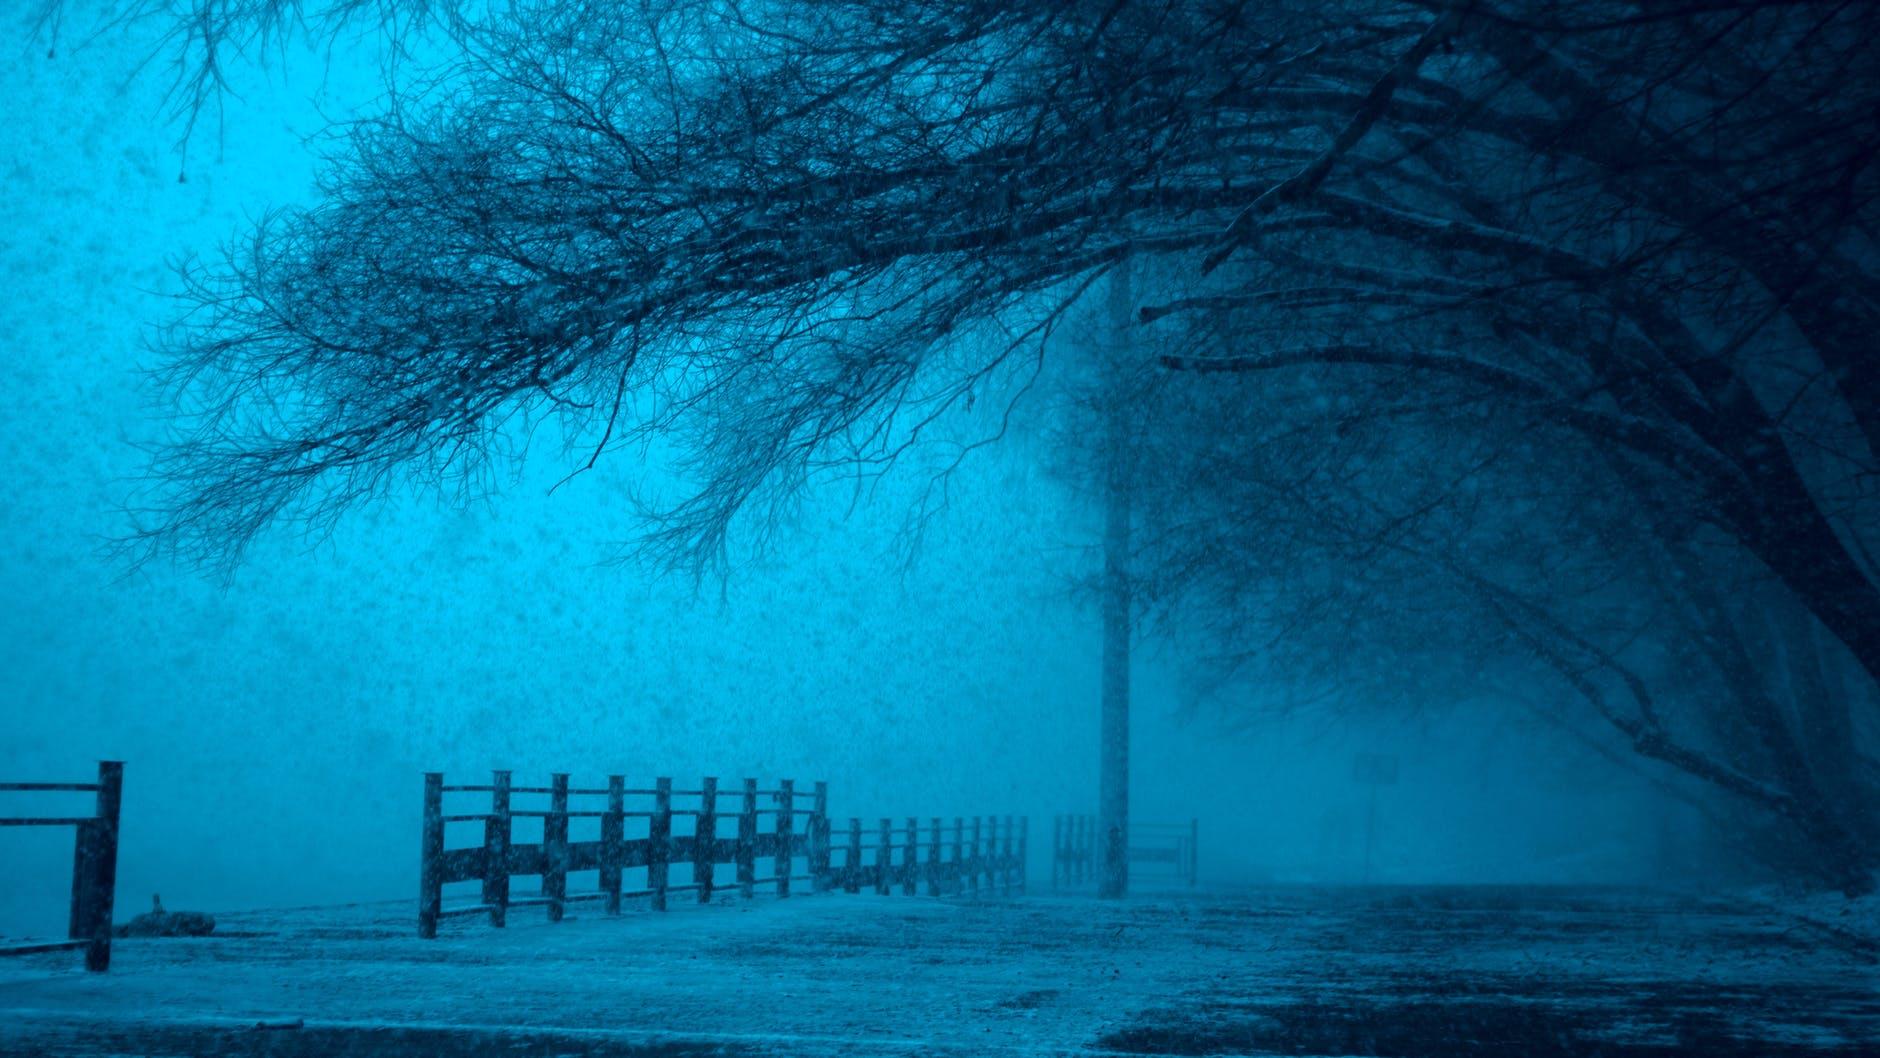 cold dark eerie fear